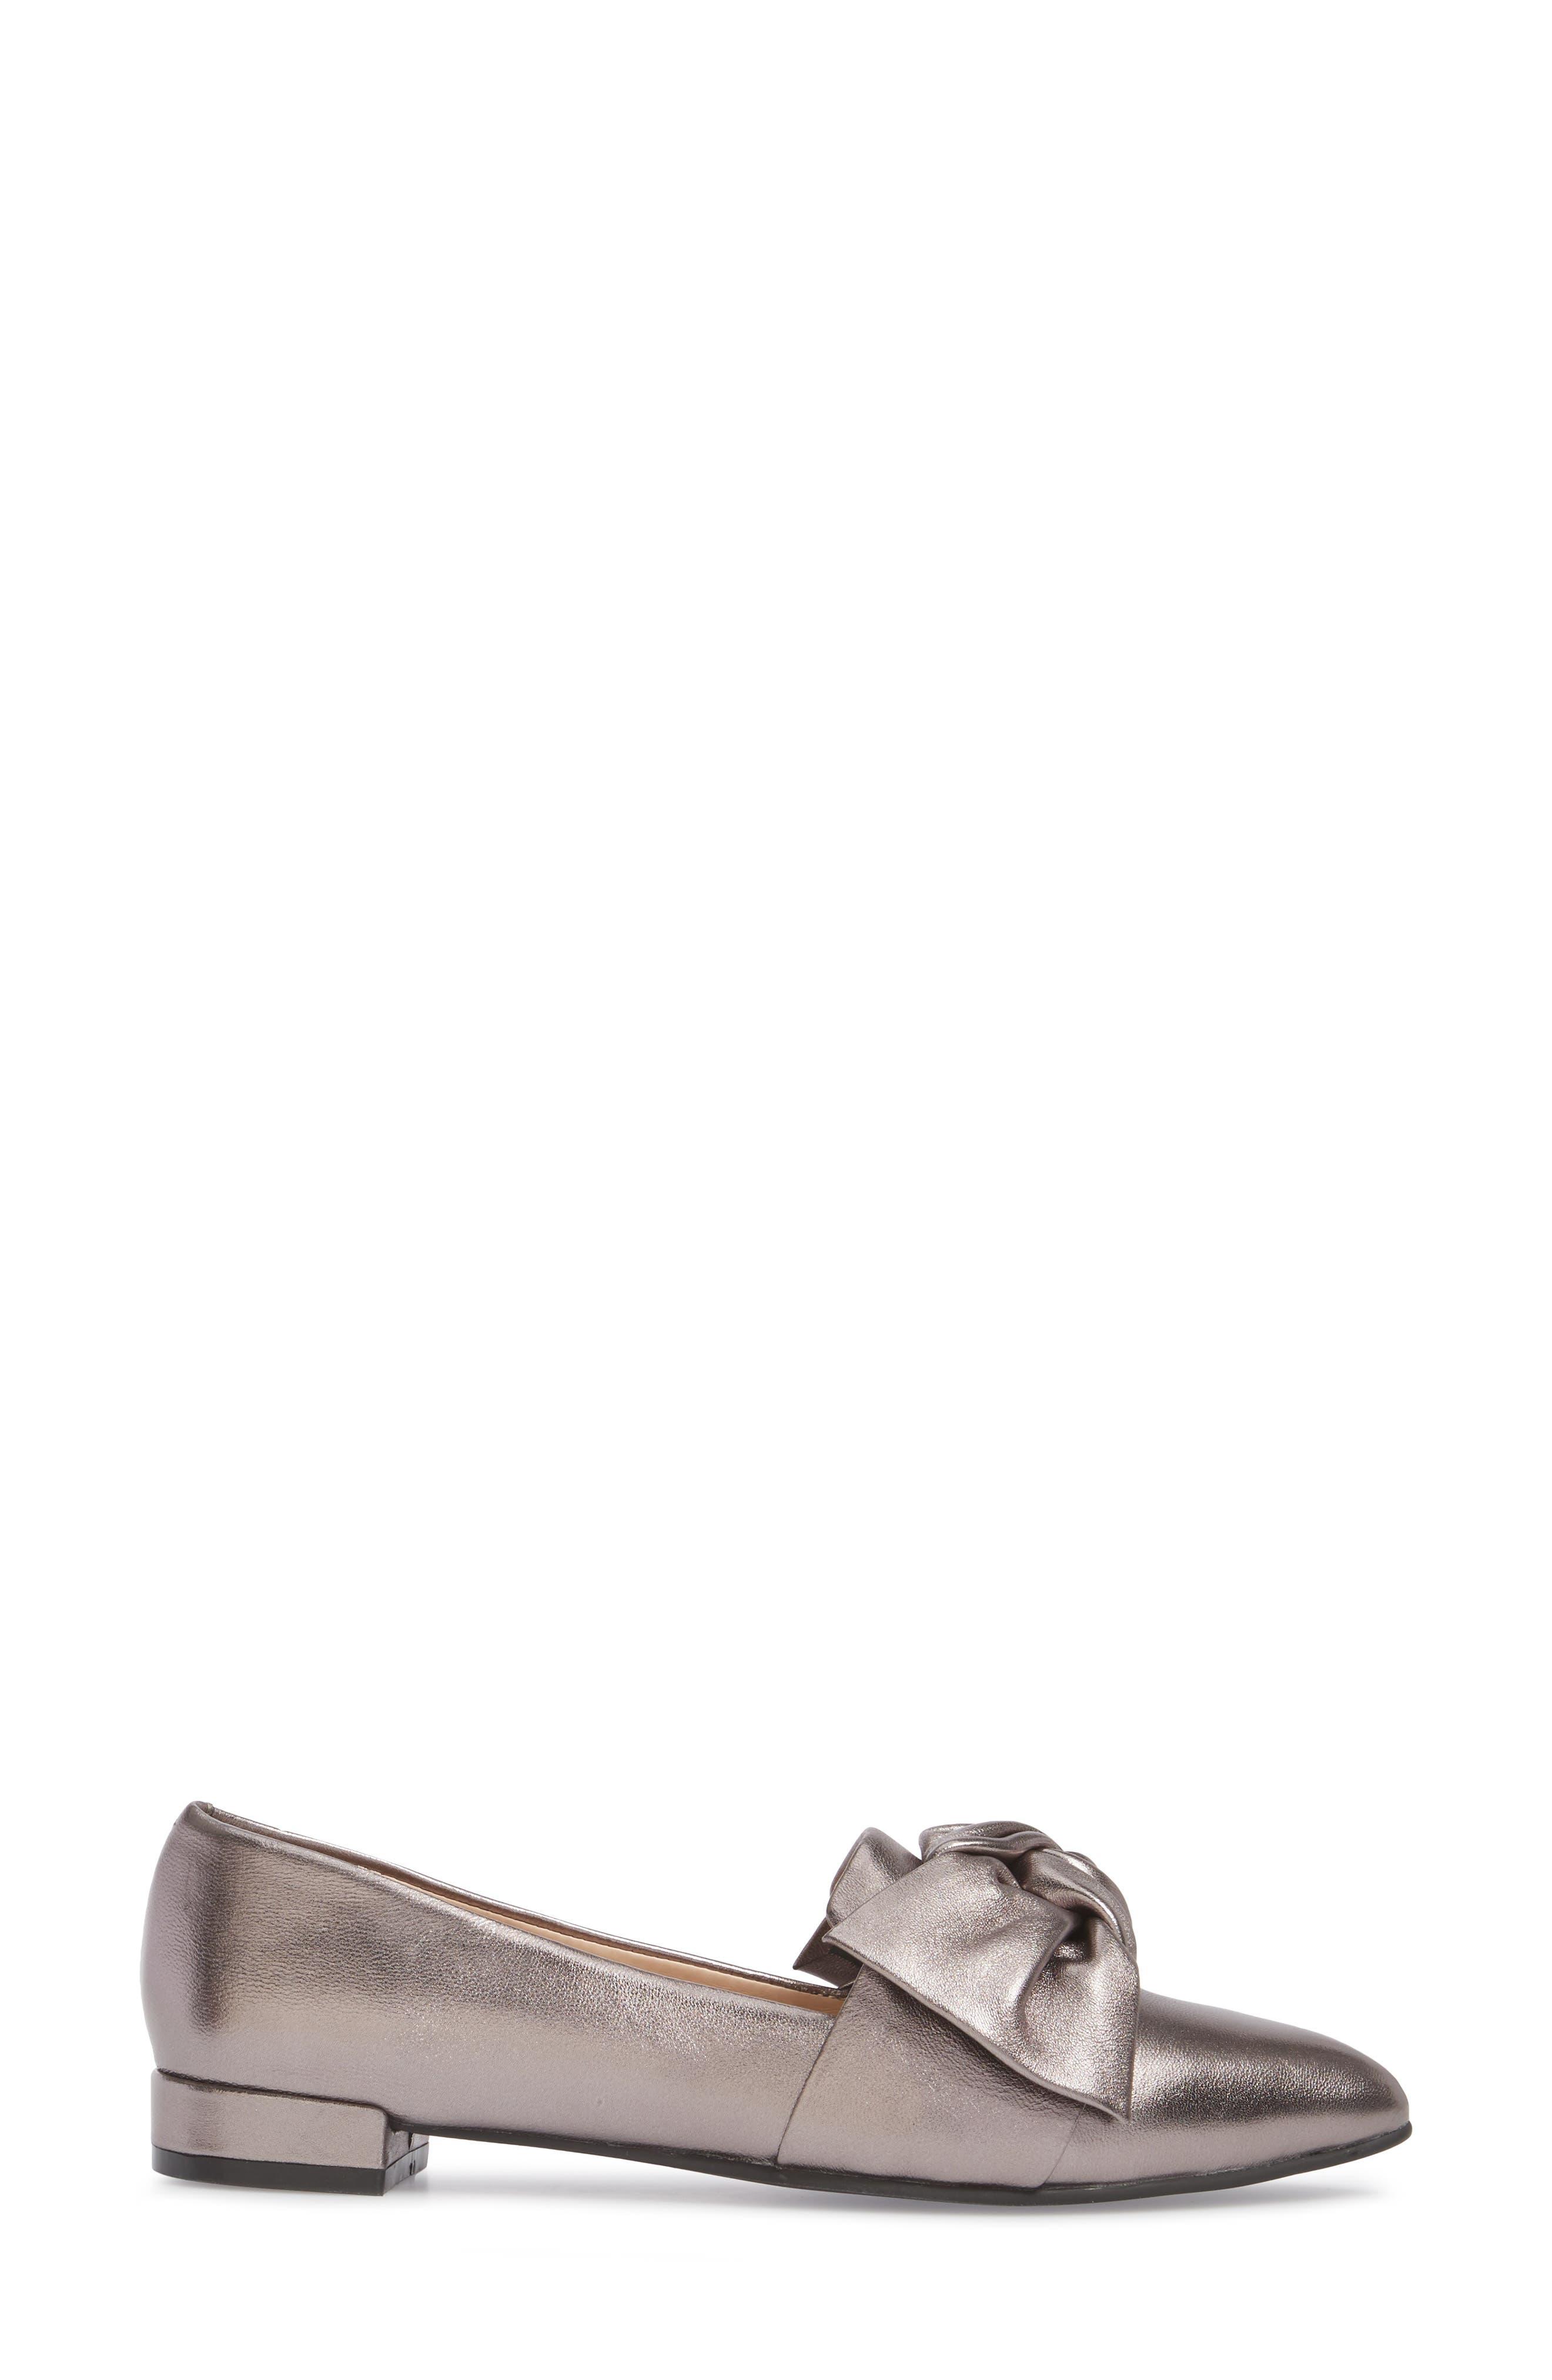 Kari Bow Loafer,                             Alternate thumbnail 3, color,                             Pewter Metallic Leather